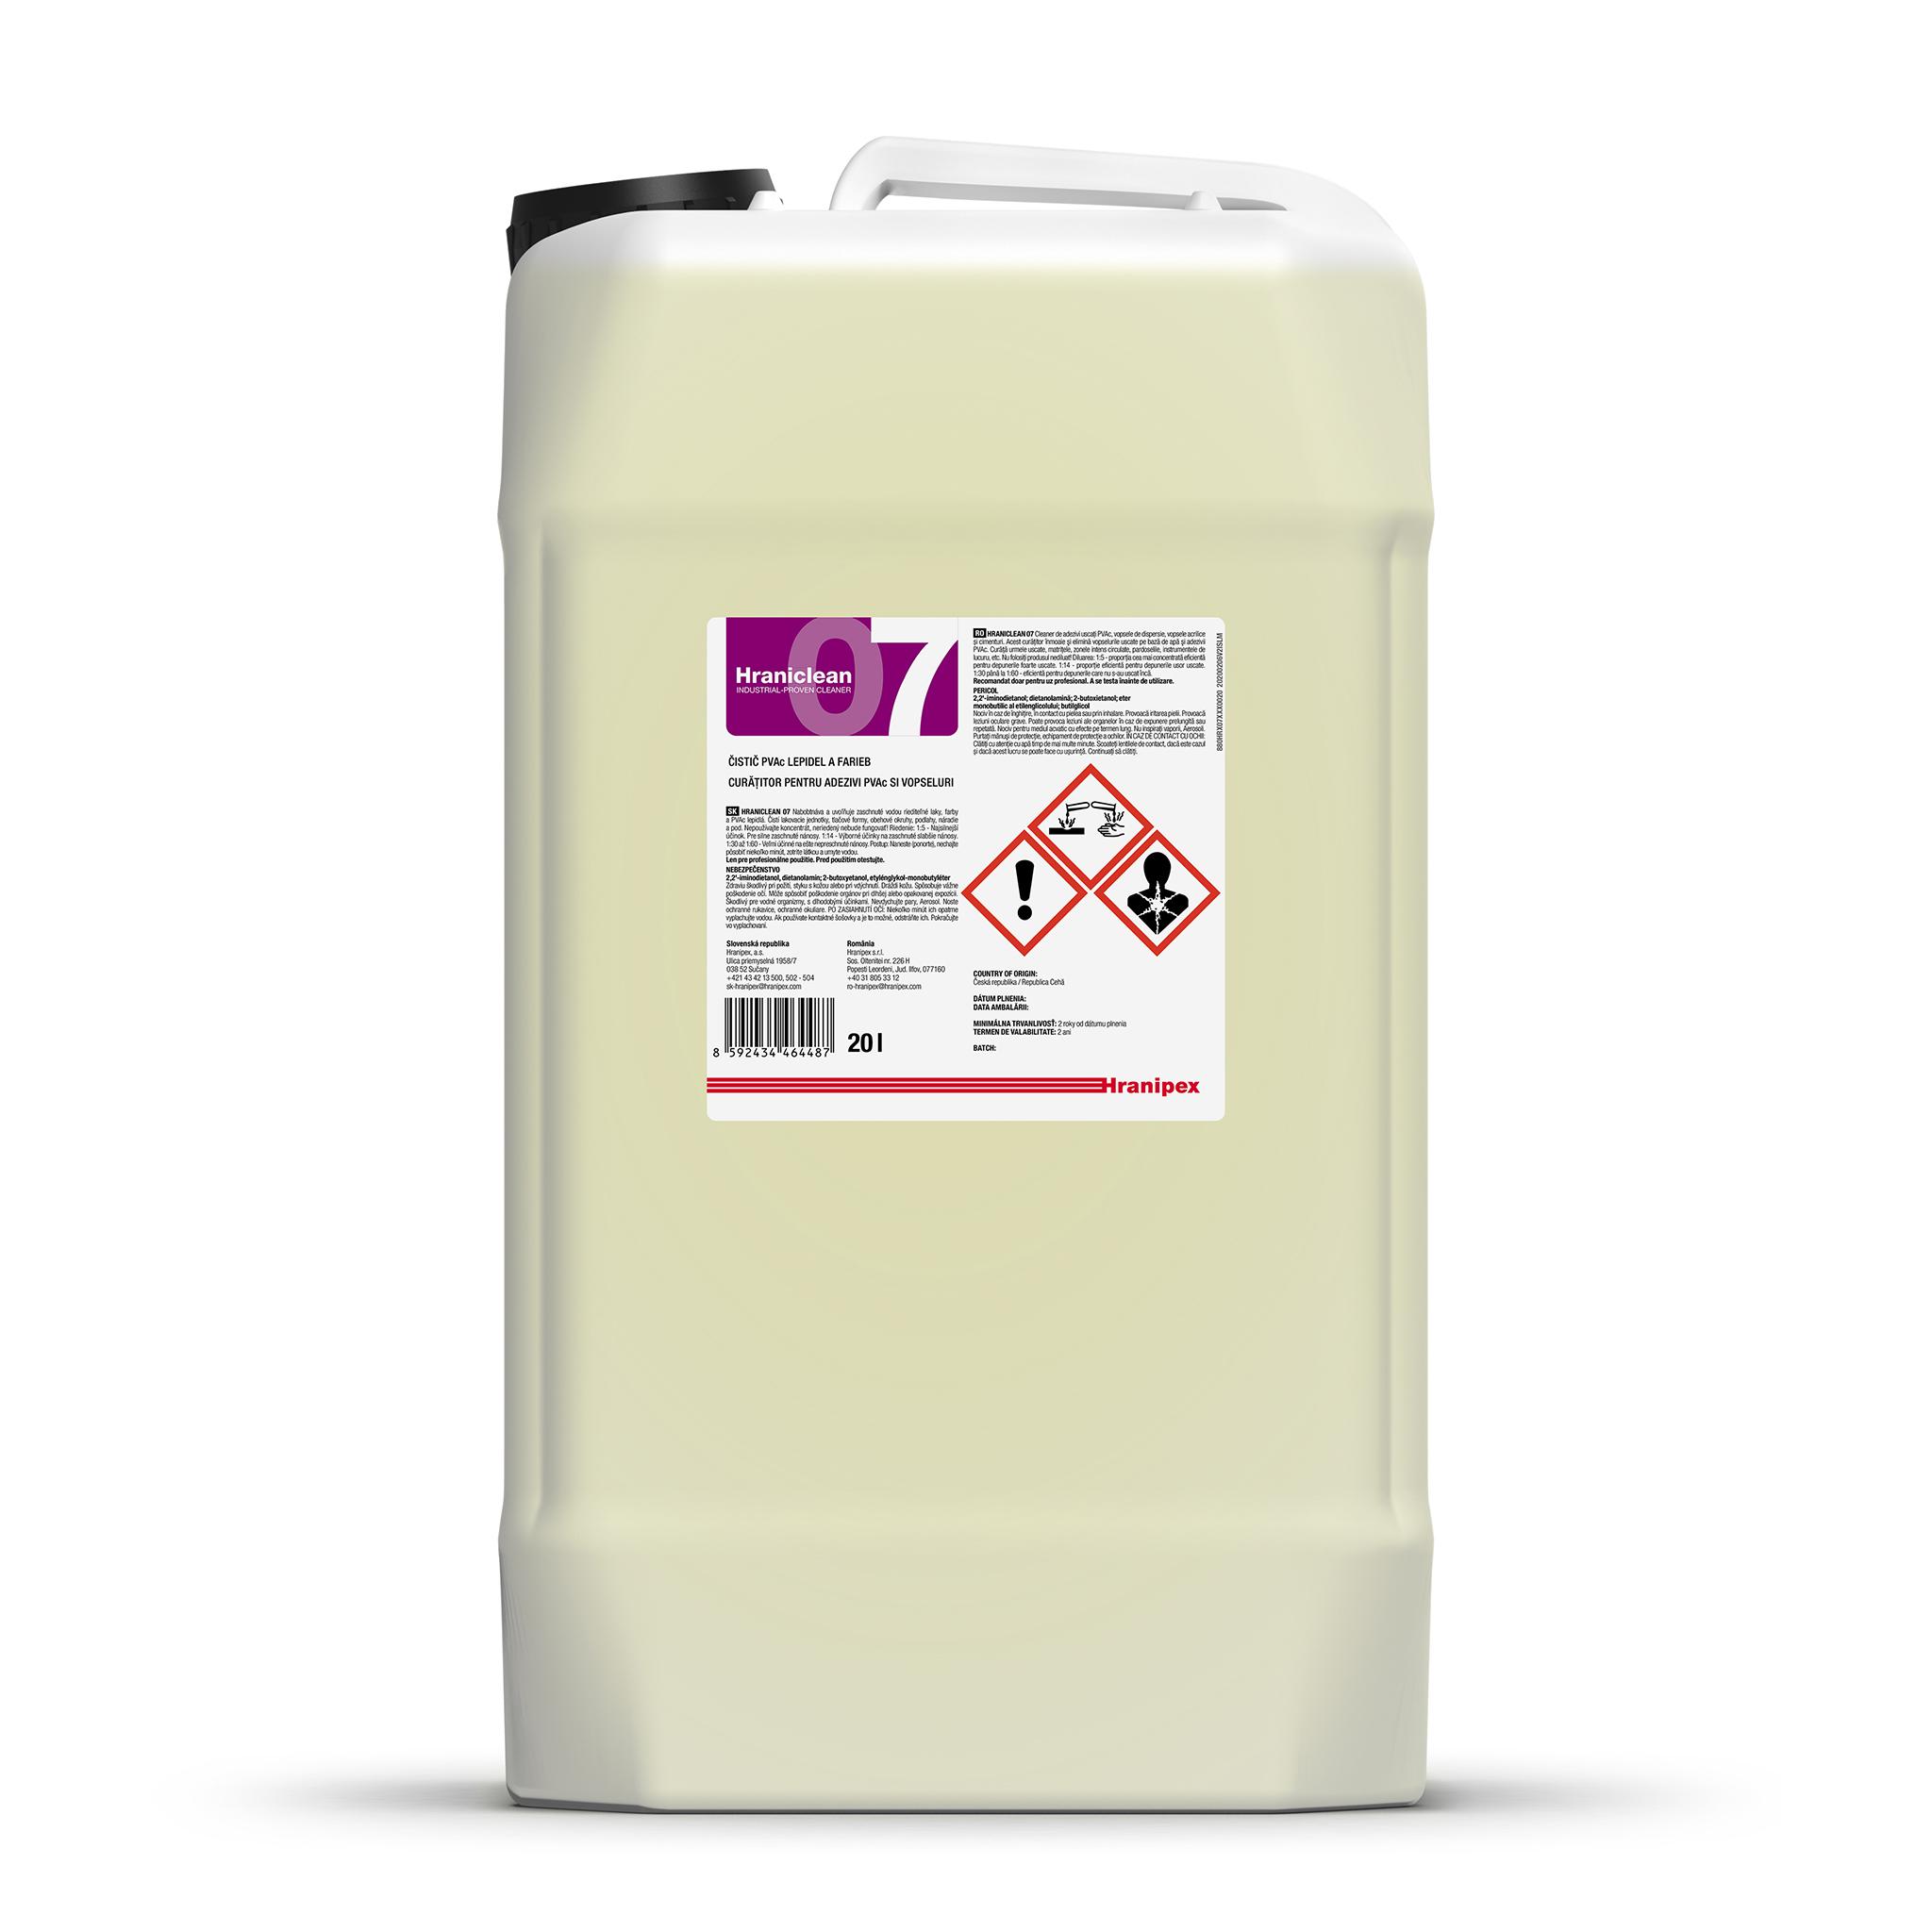 HRANICLEAN 07 reiniger voor PVAc-lijm en verf 20 l